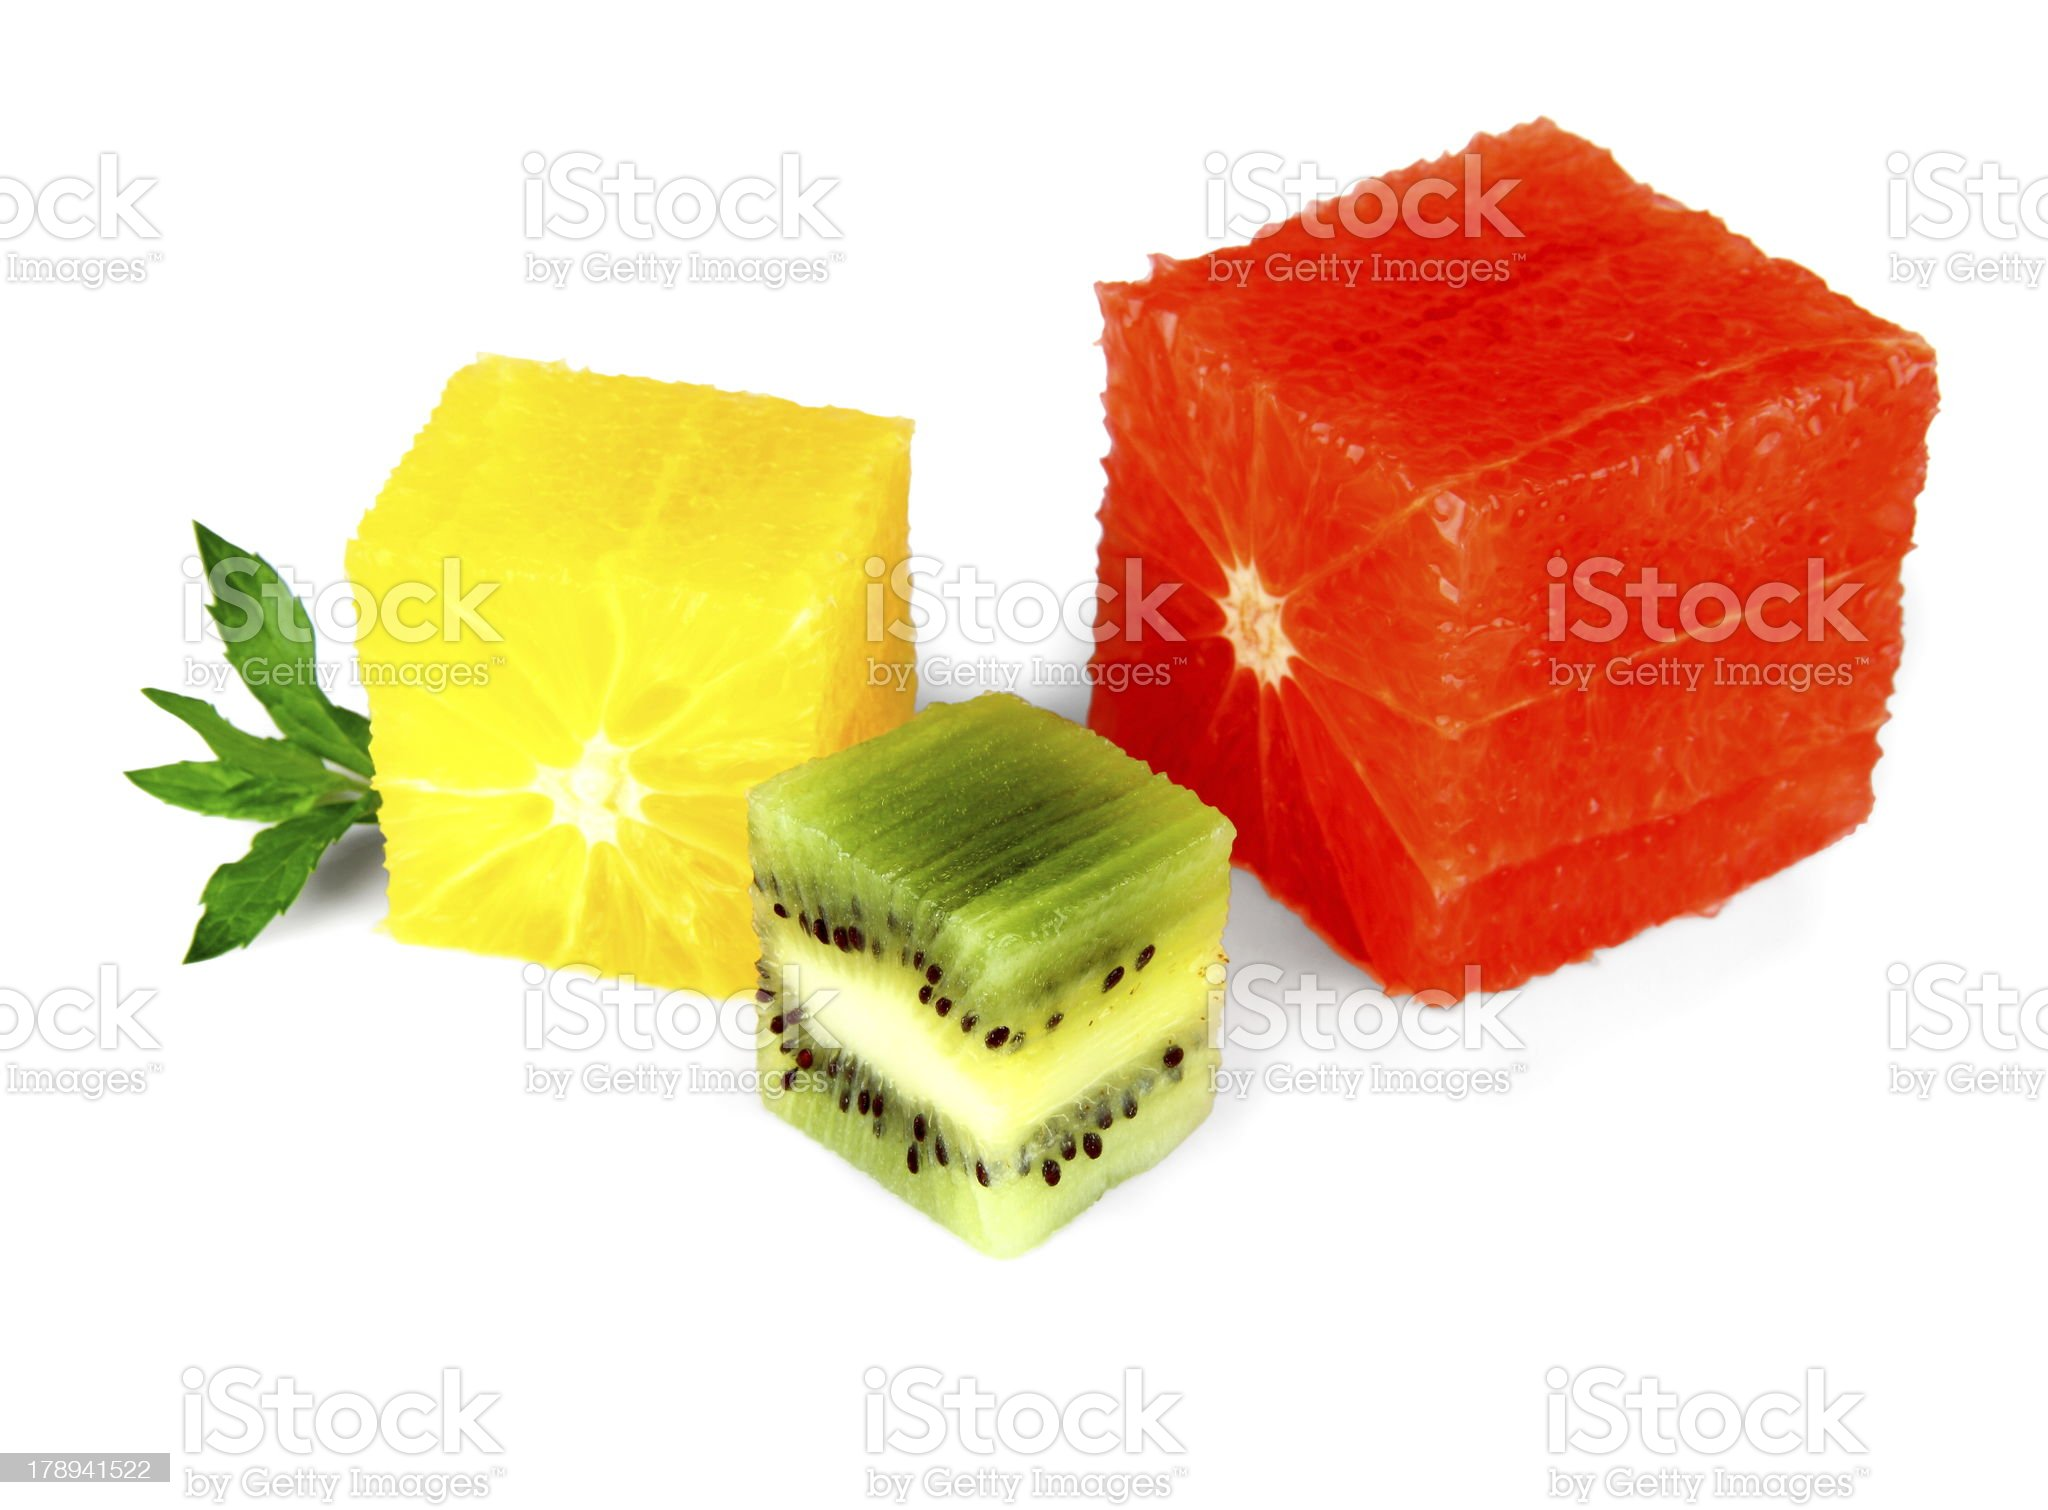 Grapefruit, oranges and kiwi cube with mint royalty-free stock photo